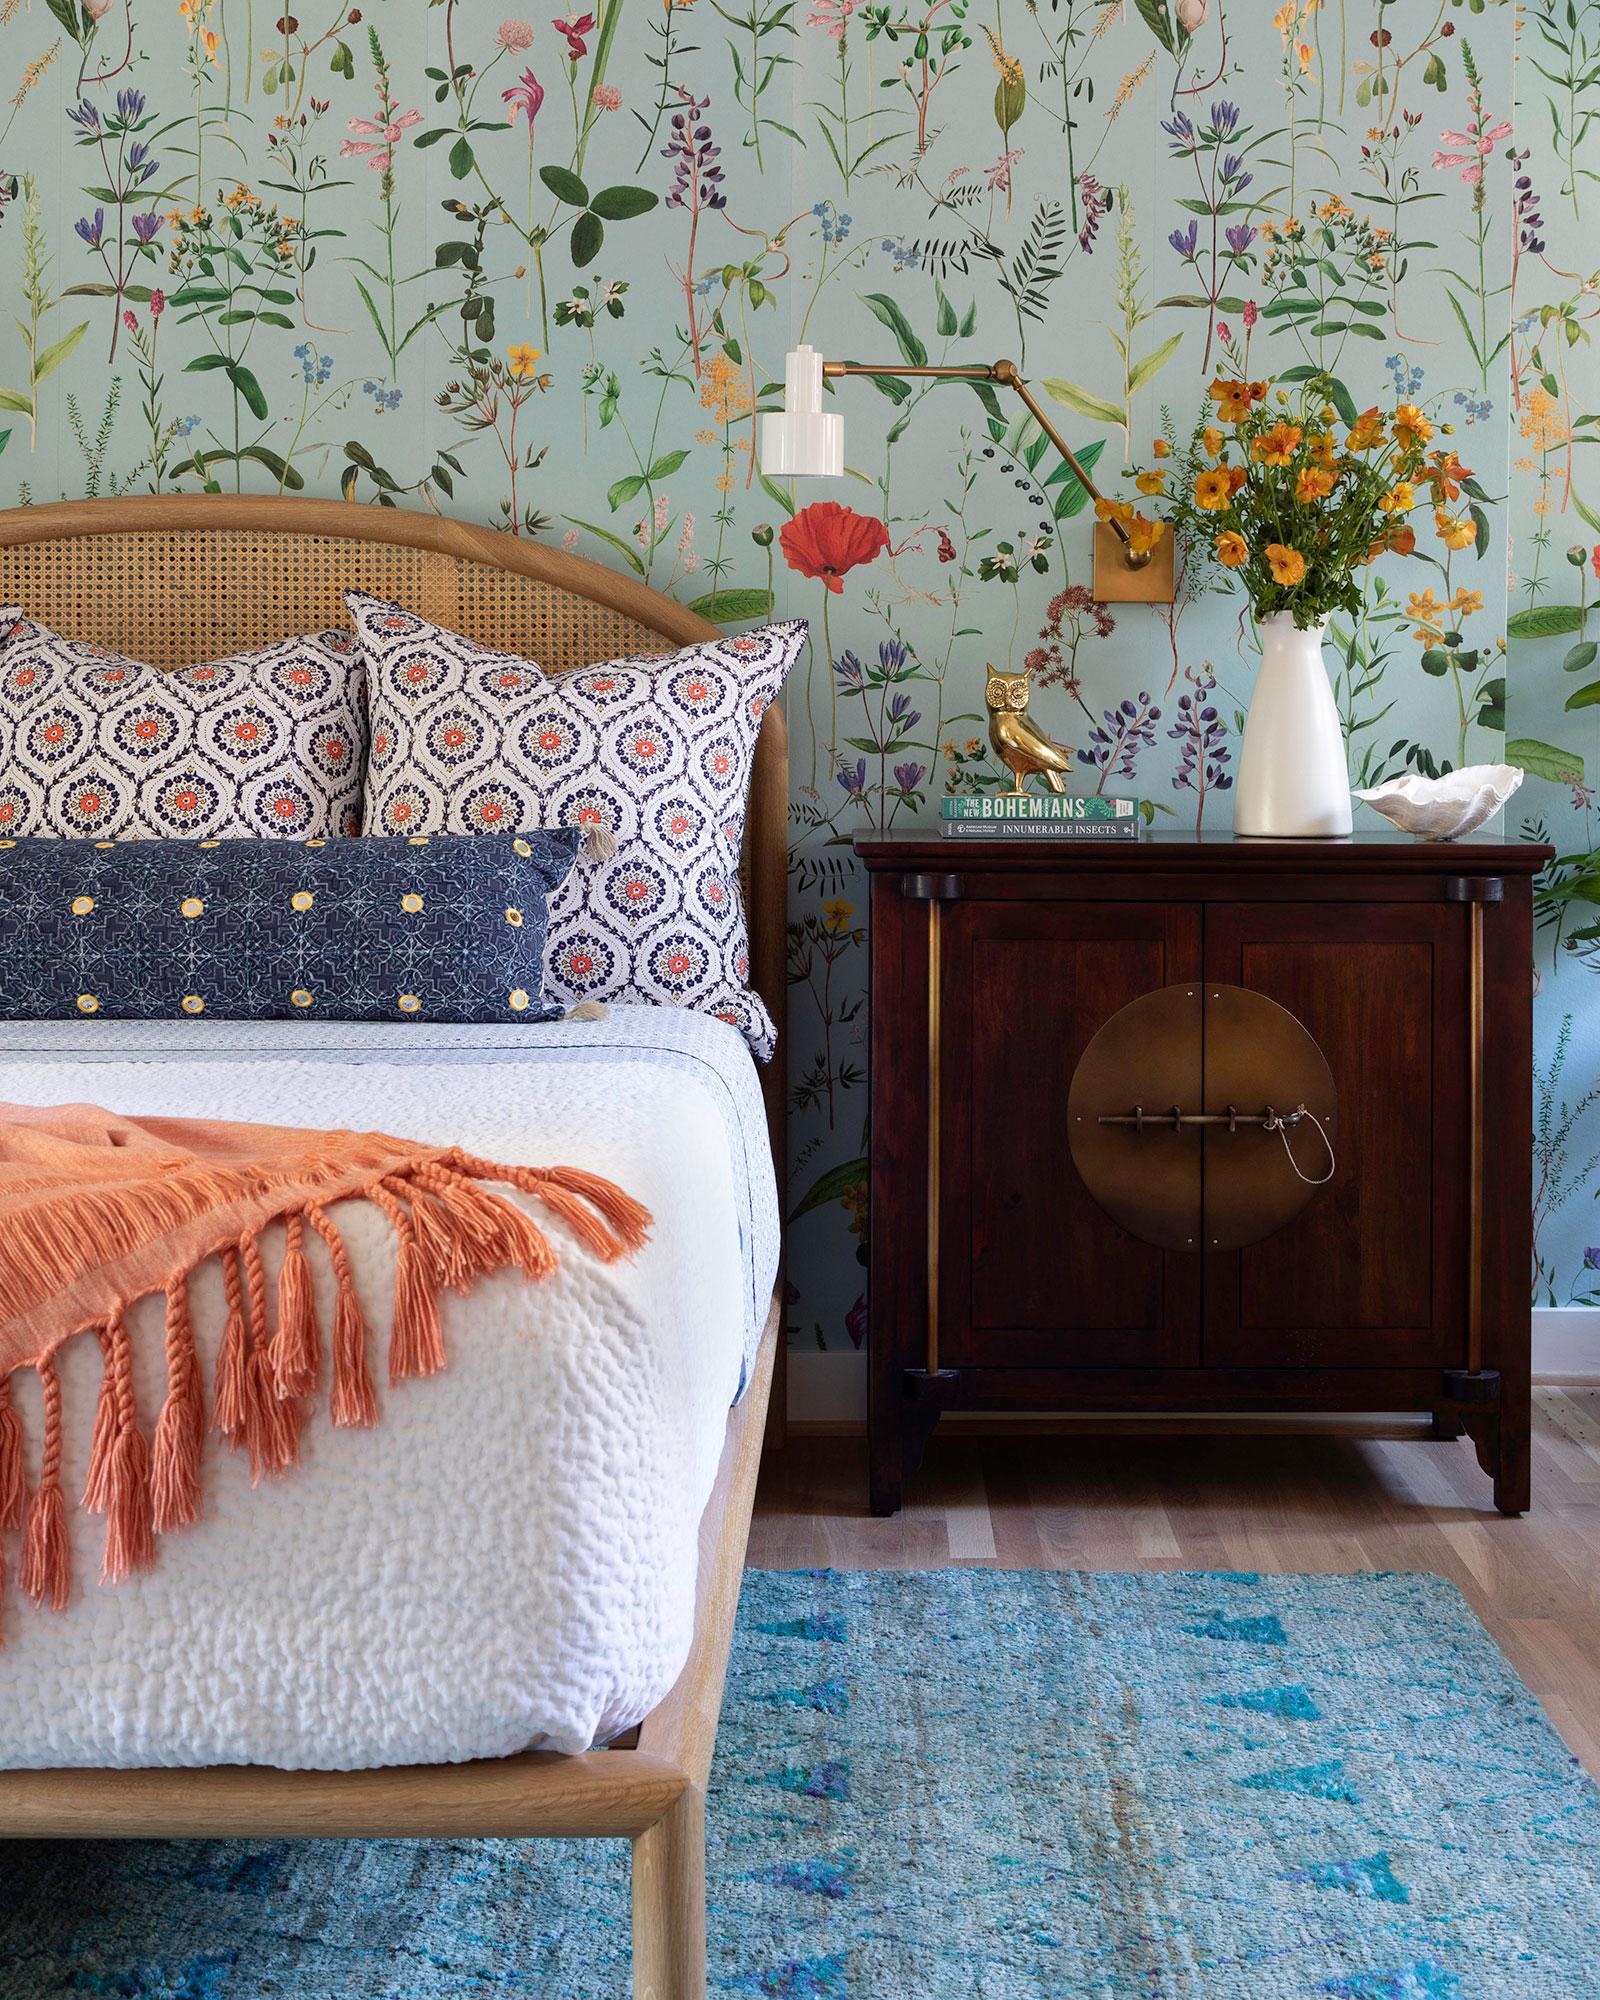 Emily-Spanos---2-Naturalist-at-Rest-Bedroom-Retreat.jpg